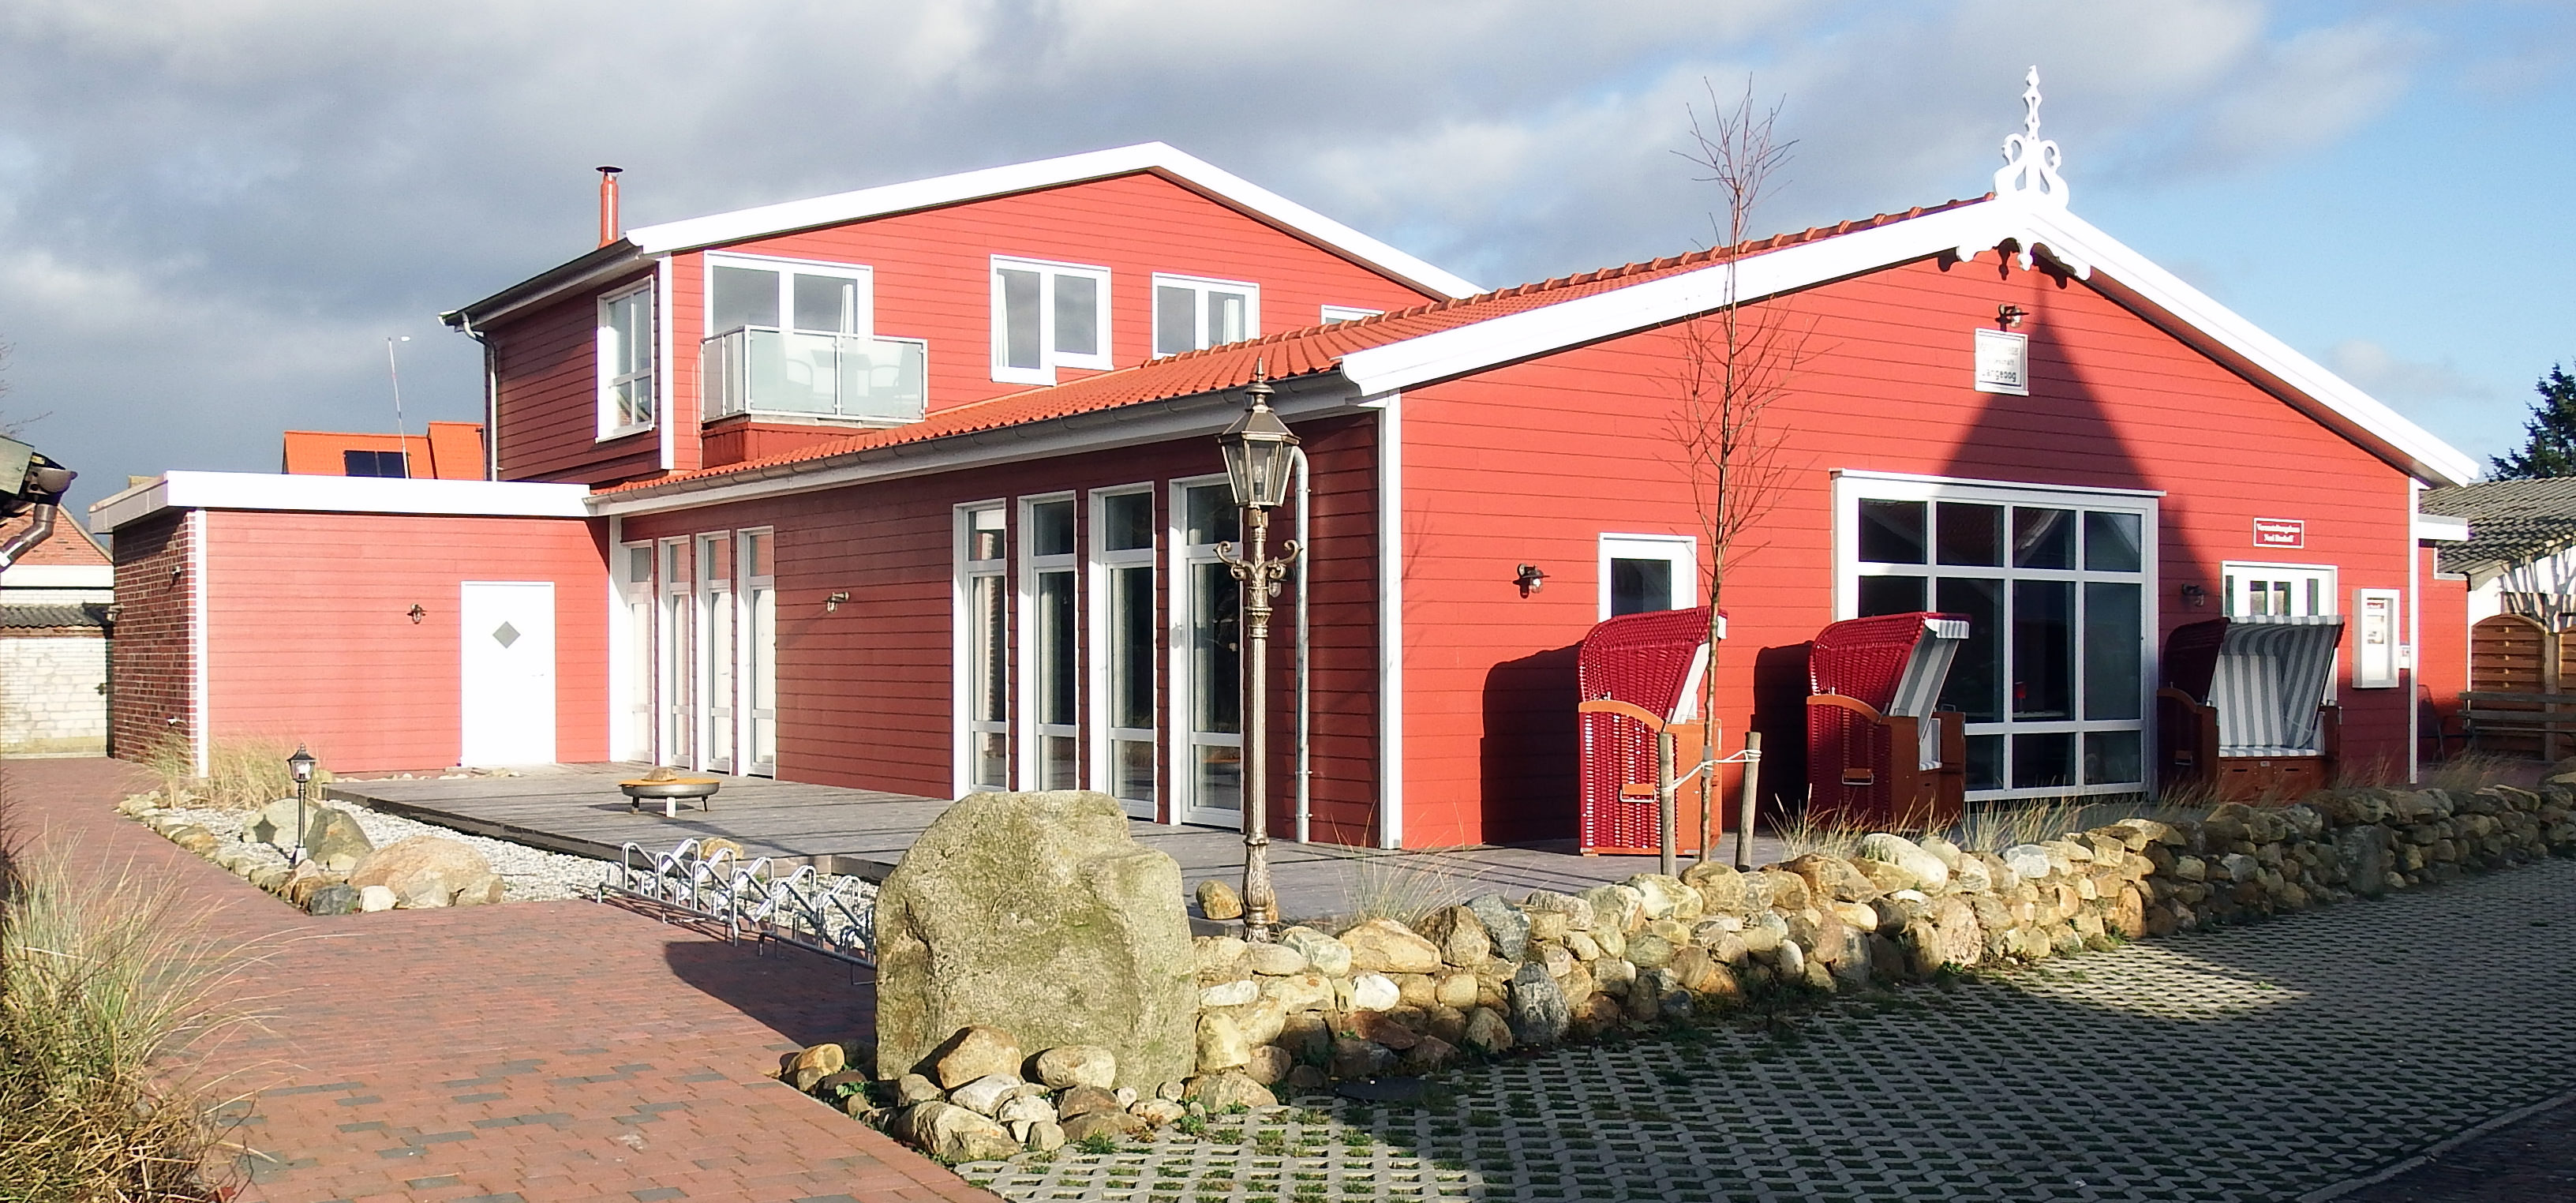 Veranstaltungshaus Neei Bauhoff